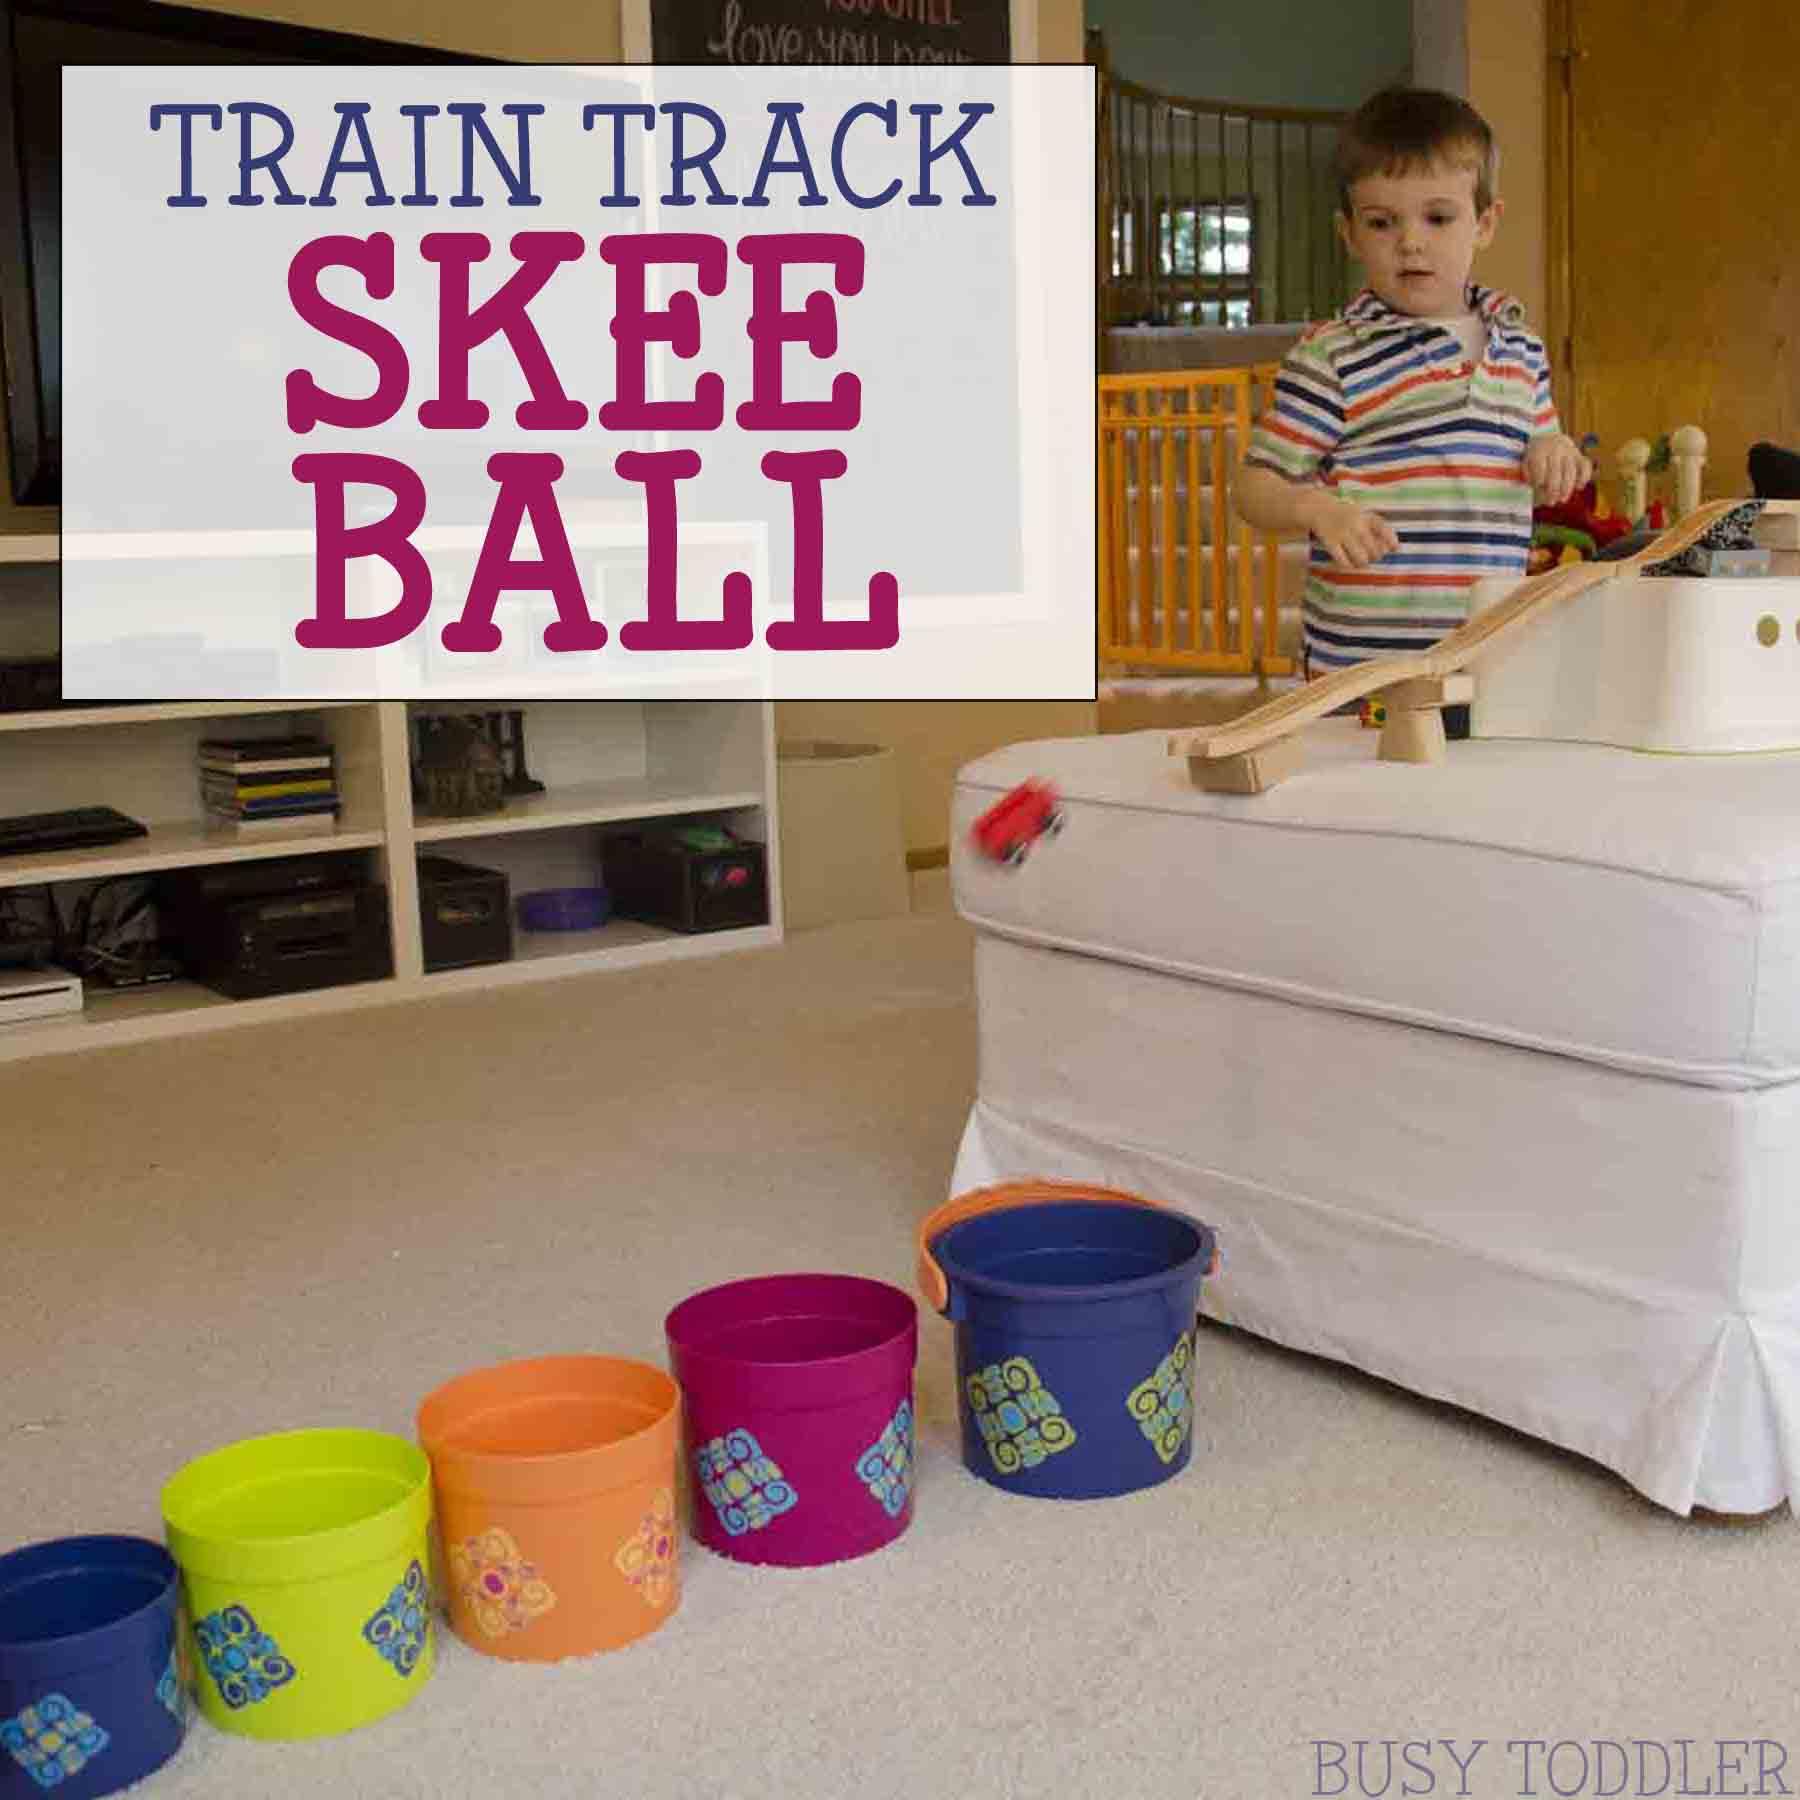 Train Track Skee Ball